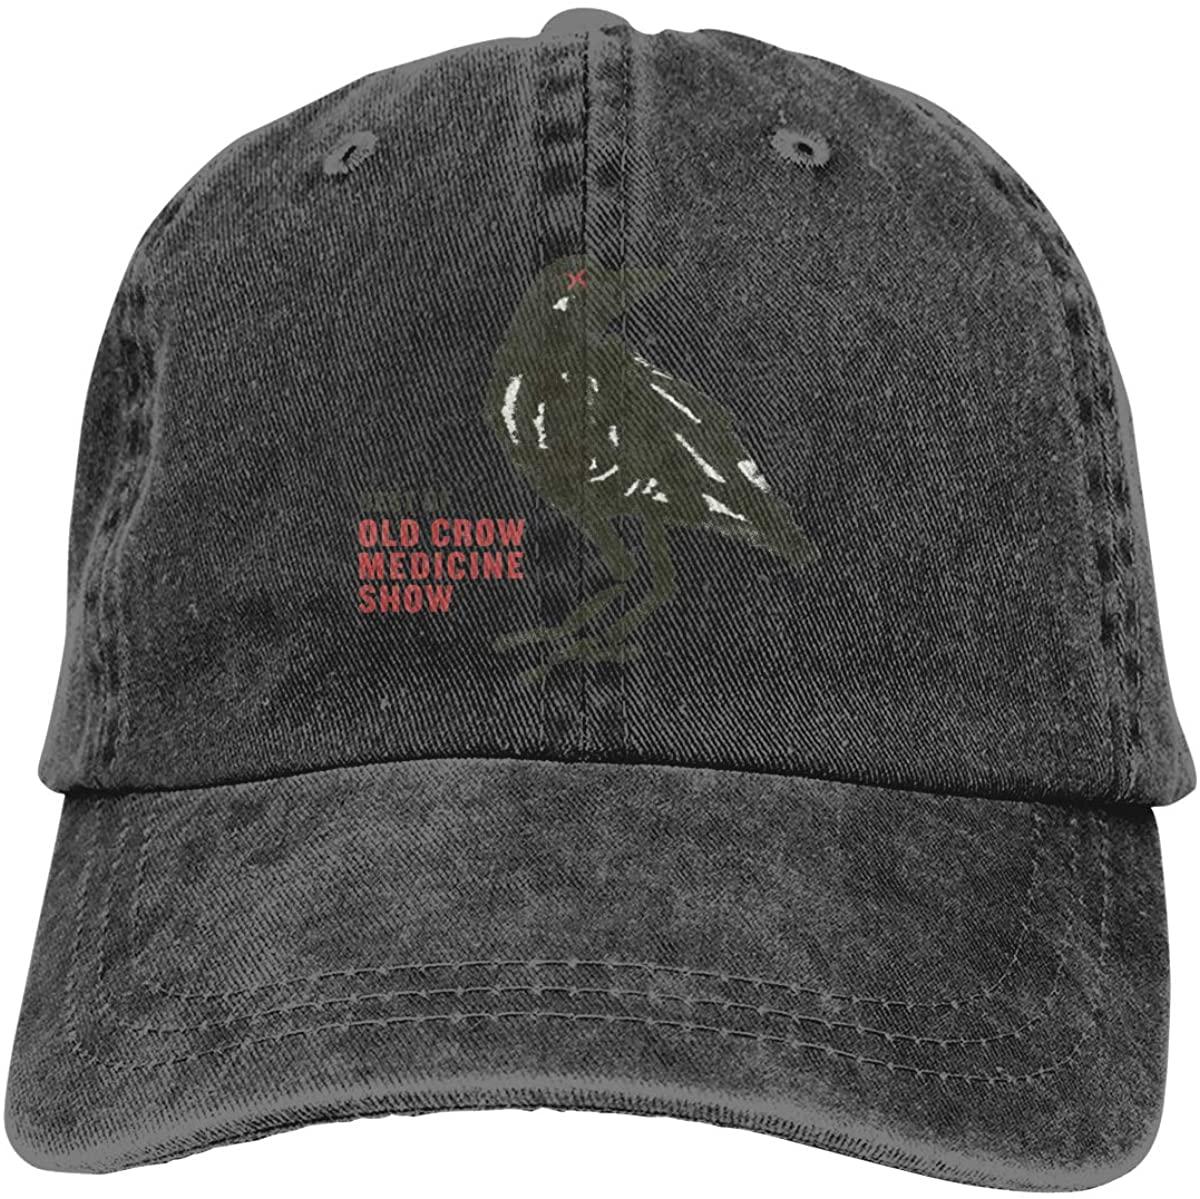 AP.Room Old Crow Medicine Show Men's Women's Baseball Cap Adult Cowboy Hat Adjustable Athletic Hat